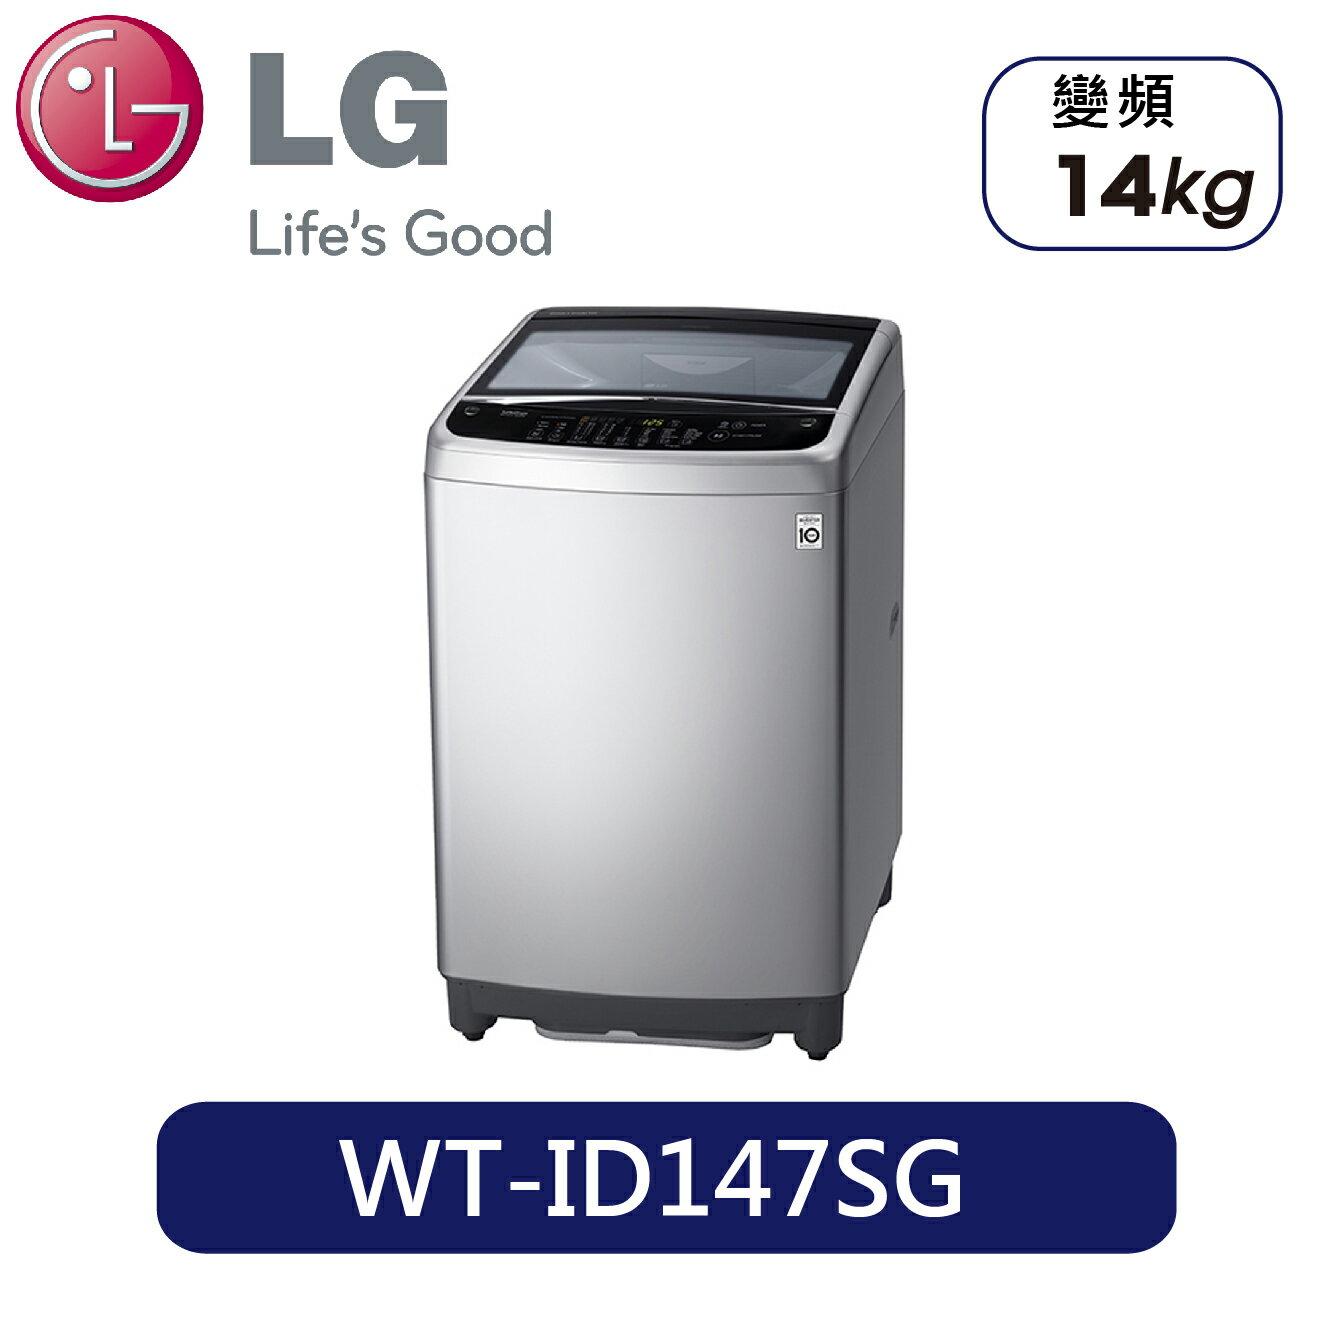 LG | 14KG 智慧變頻 直立式洗衣機 精緻銀 WT-ID147SG